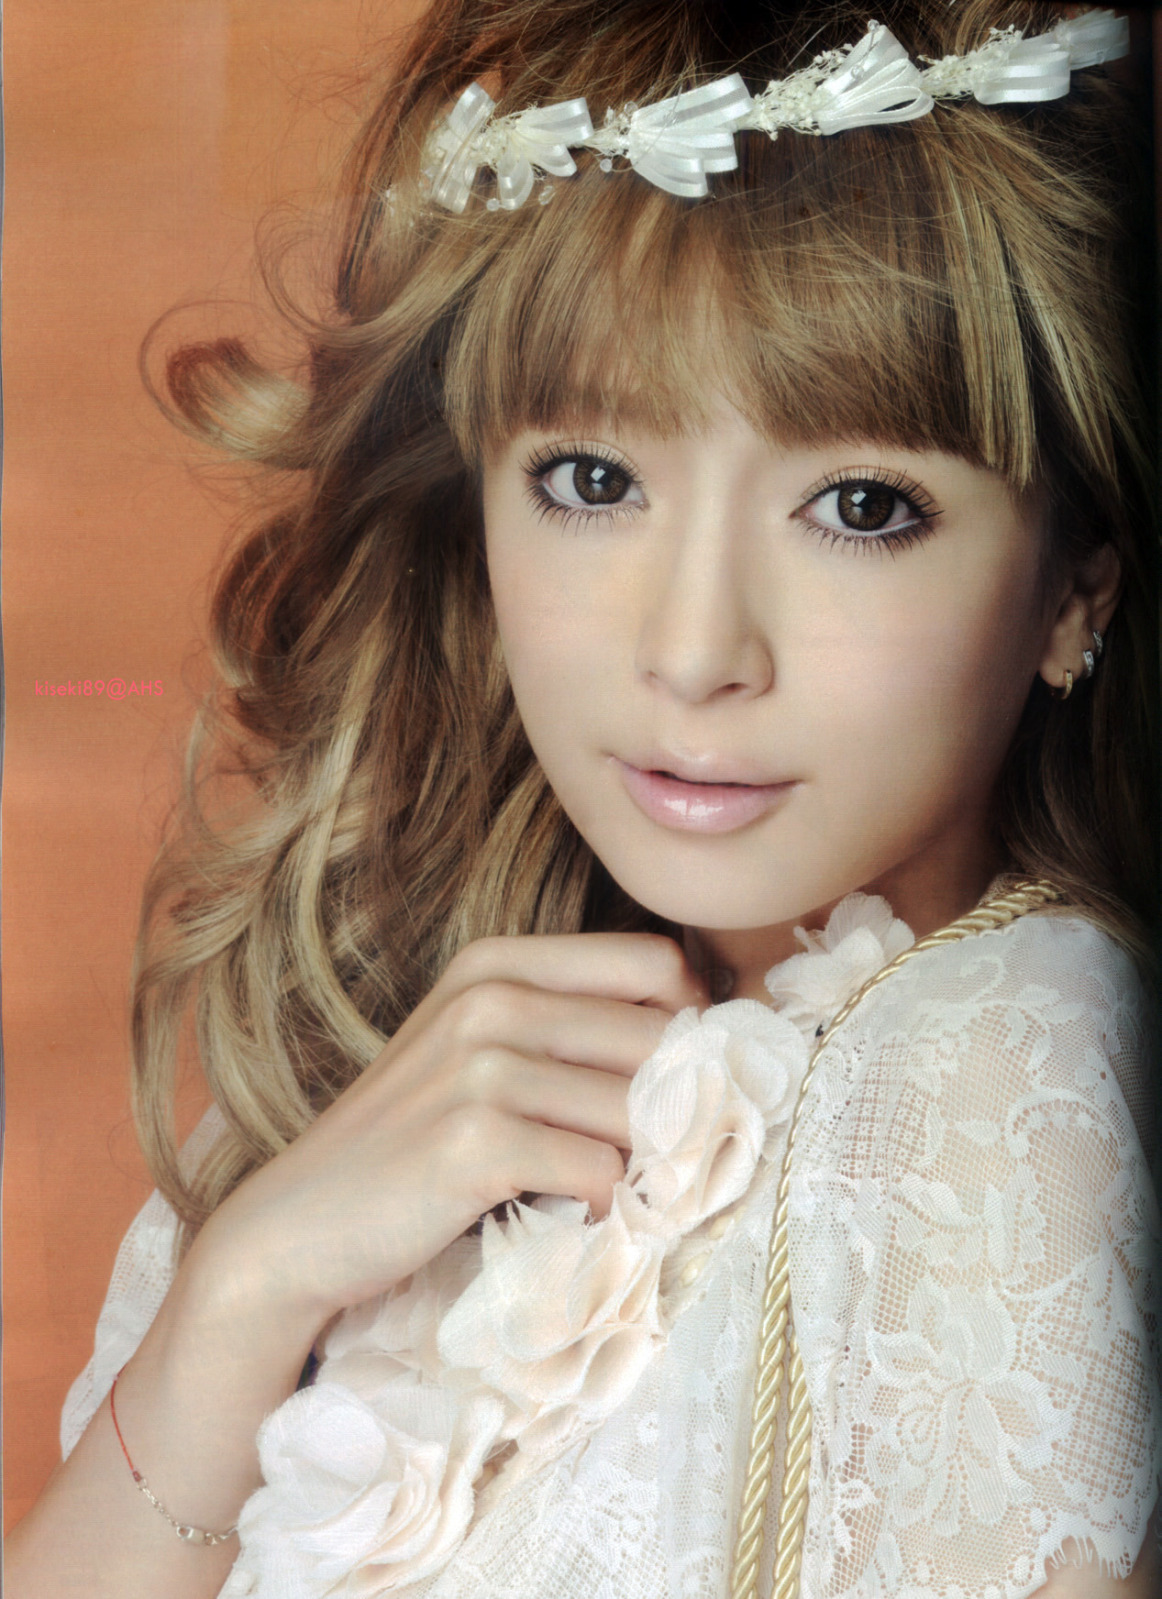 http://images2.fanpop.com/images/photos/7500000/Ayumi-Hamasaki-ayumi-hamasaki-7569593-1162-1599.jpg